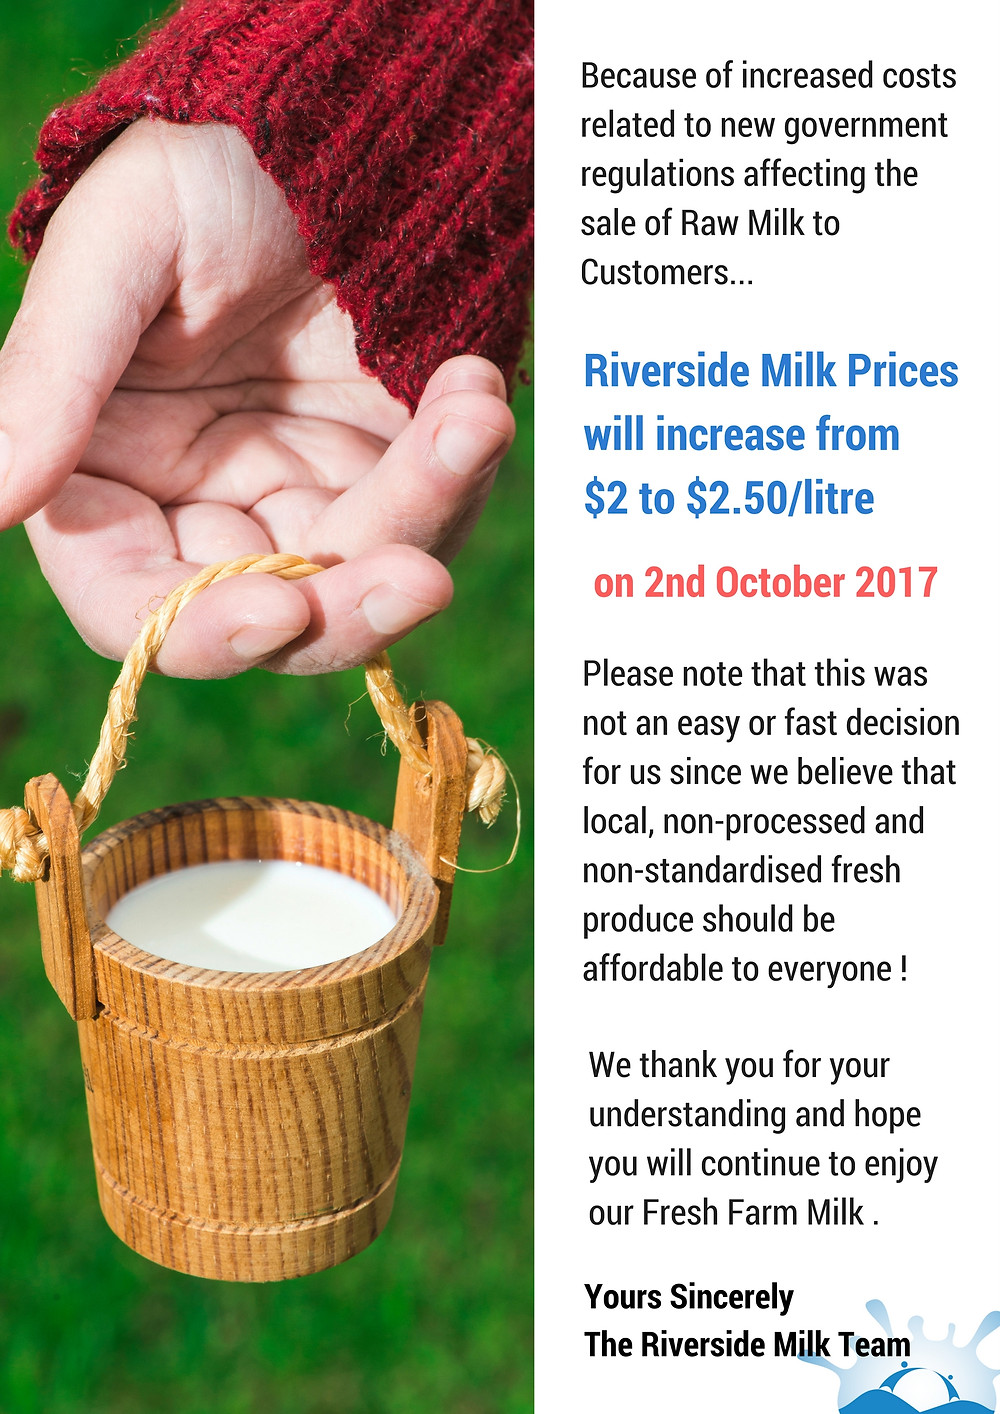 Fresh Riverside Milk Prices increase to $2.50